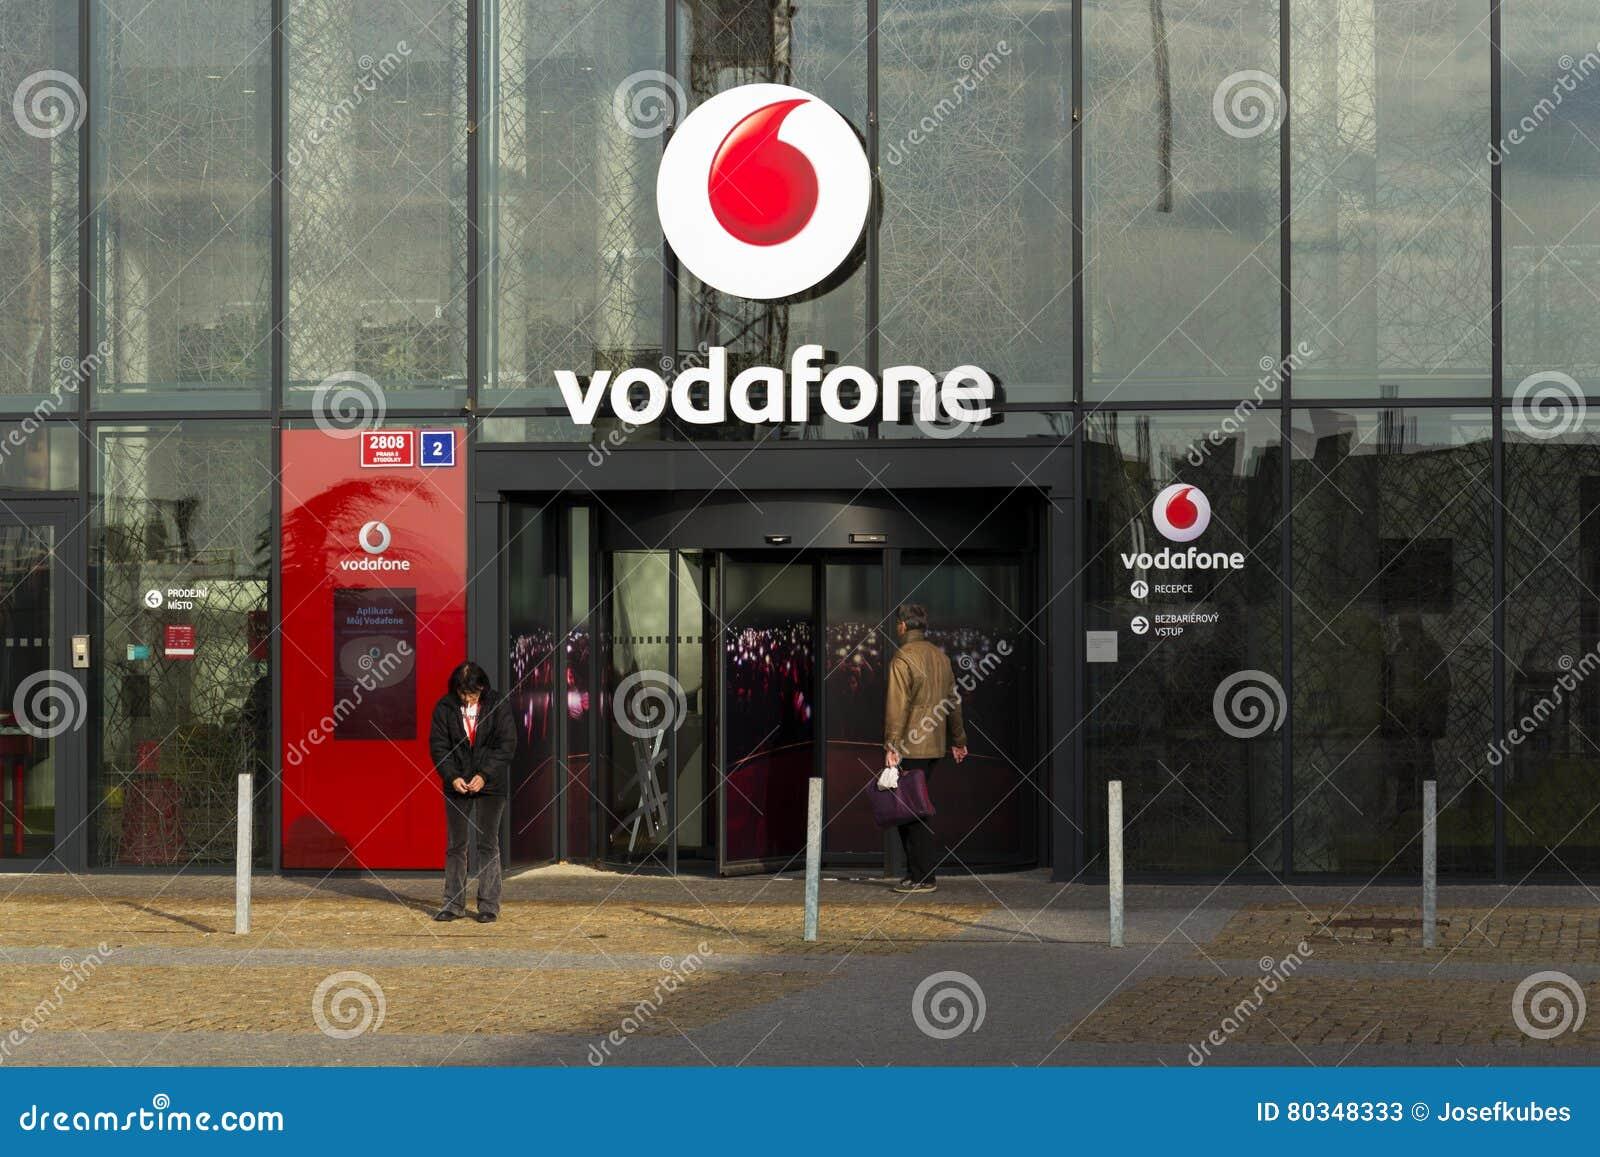 Vodafone Telecommunications Company Logo On Czech Headquarters